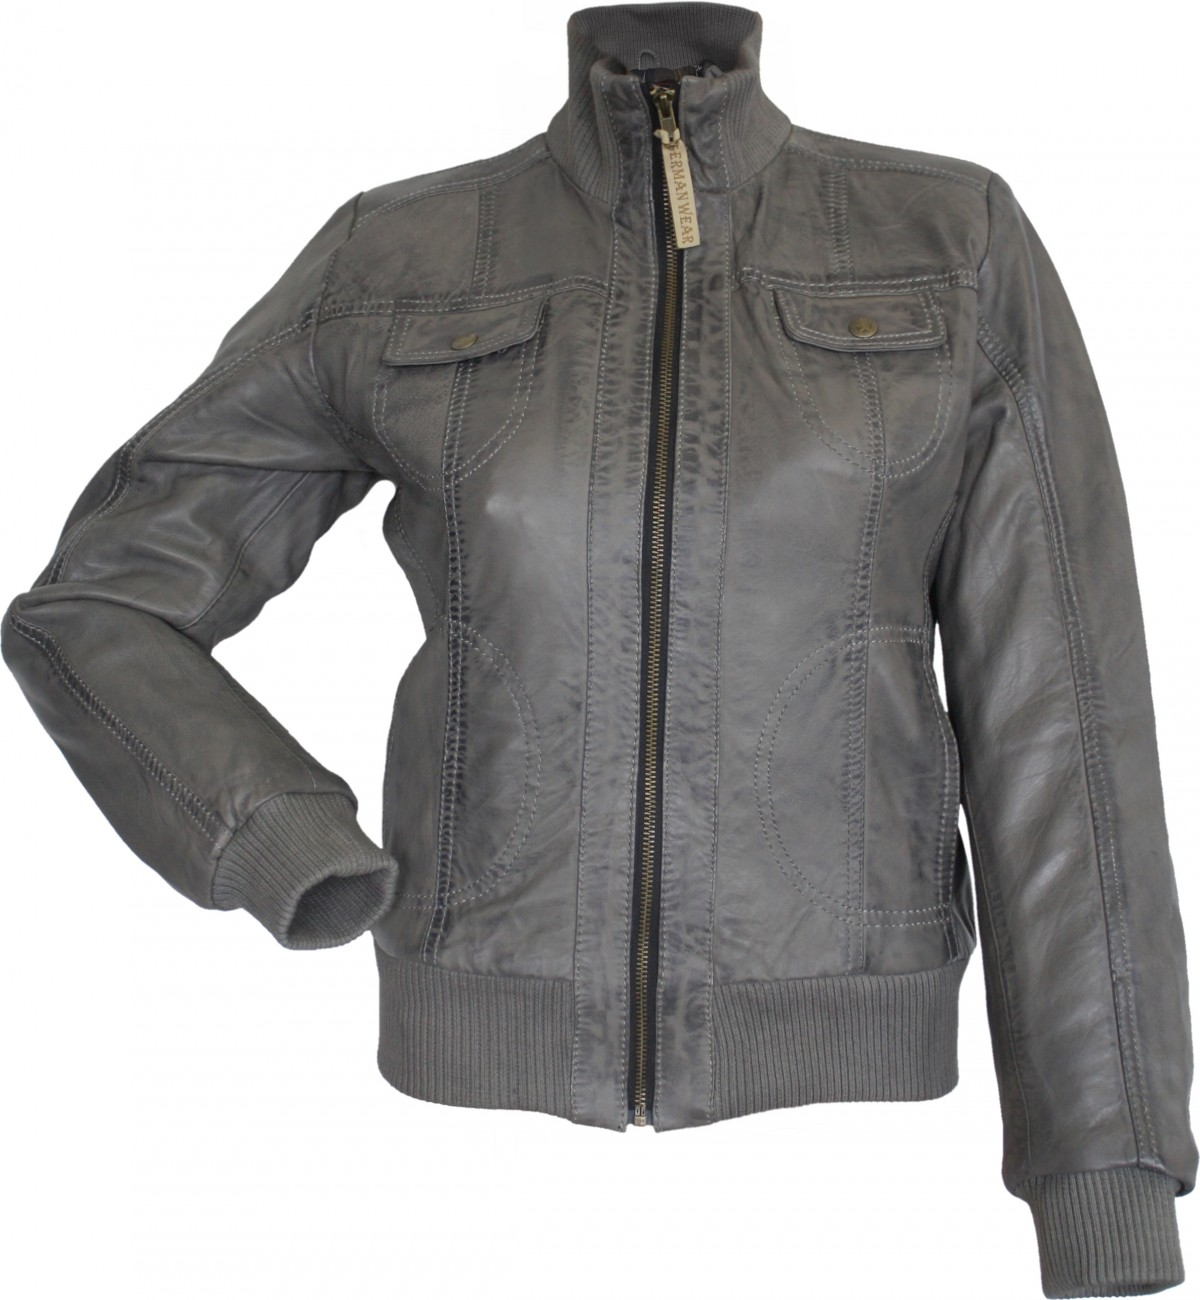 new concept ae0dc 30efd German Wear, Damen Lederjacke Trend Fashion echtleder Jacke aus Lamm Nappa  Leder grau